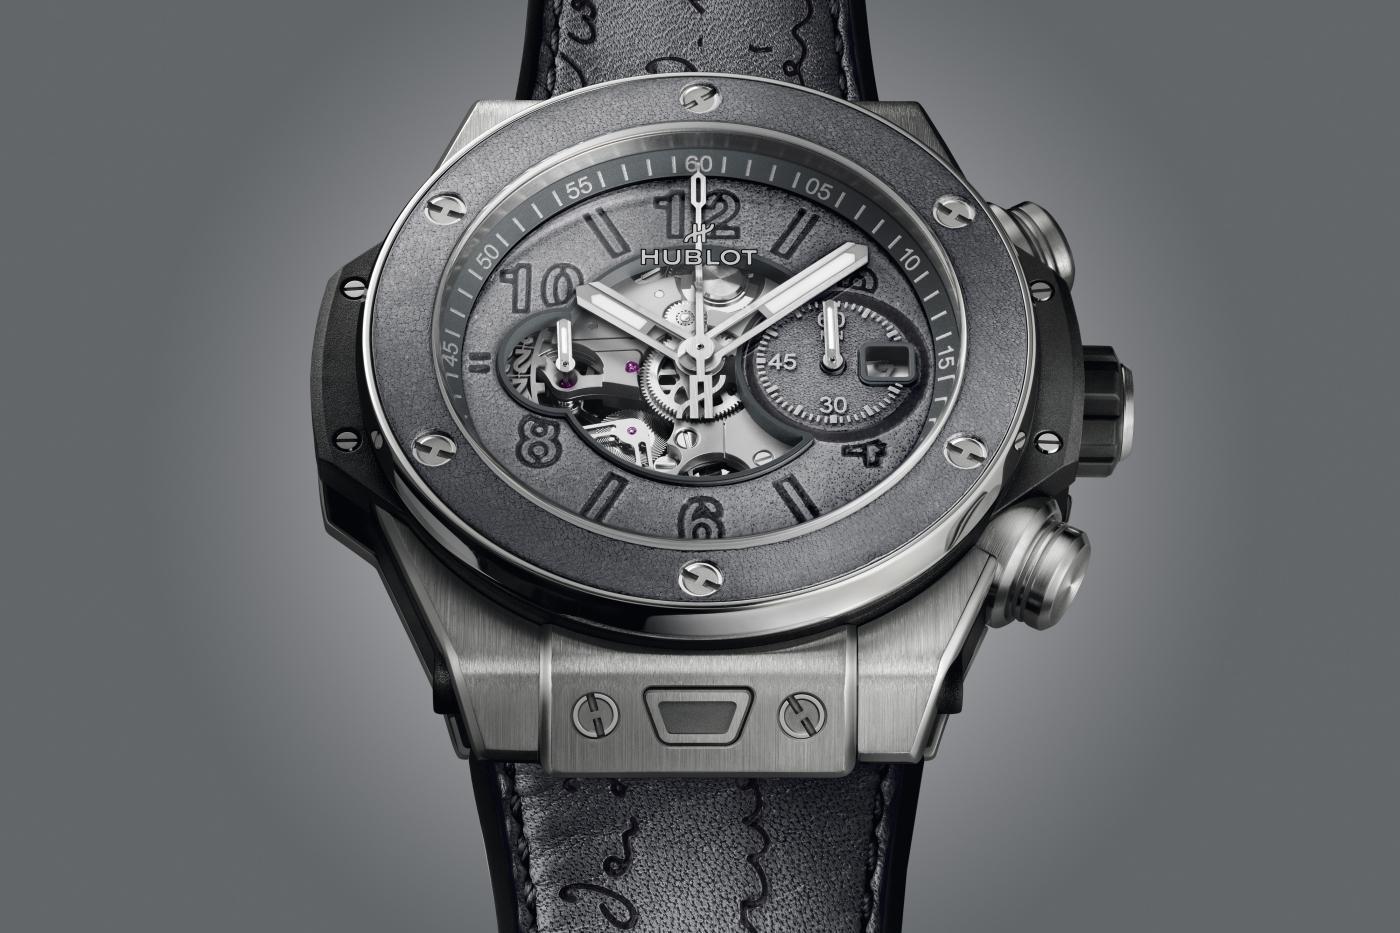 HUBLOT_メンズ腕時計①